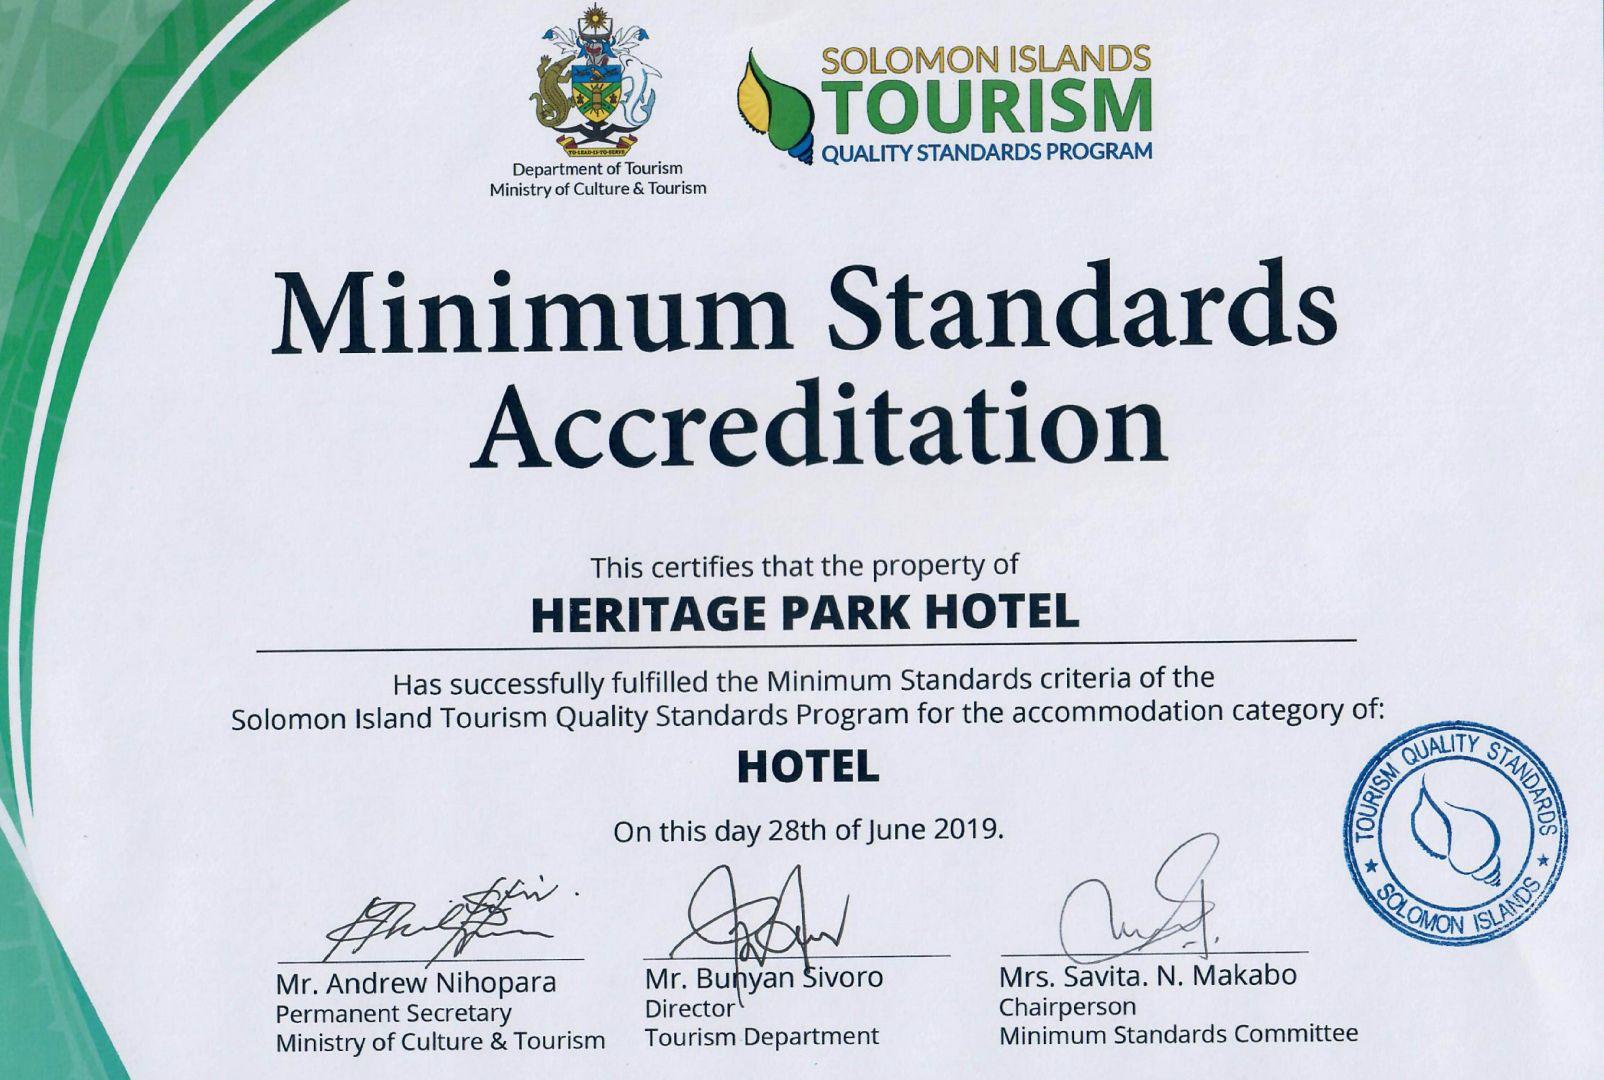 Minimum Standards Accreditation